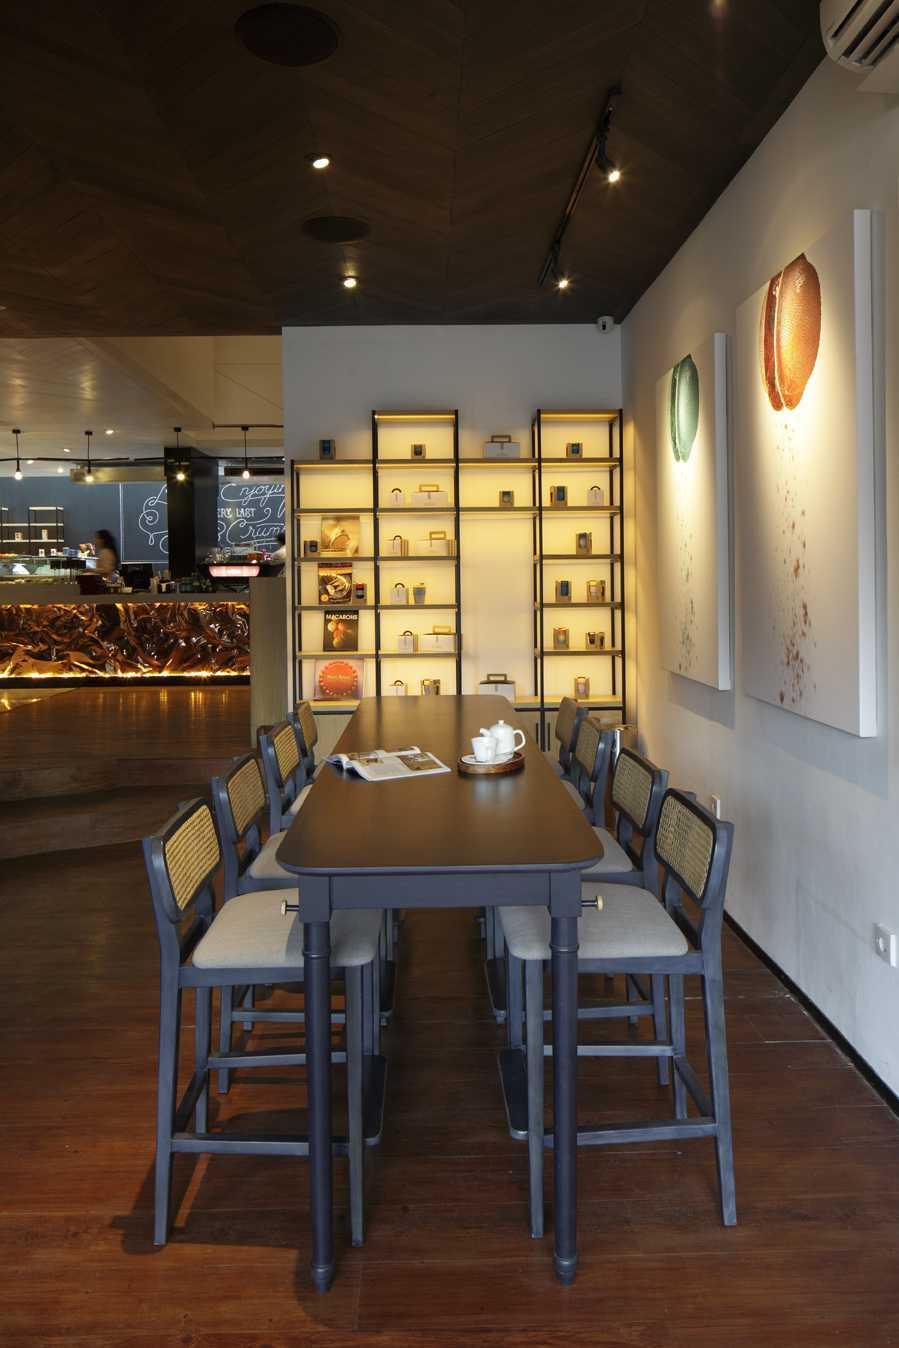 Alvin Tjitrowirjo, Alvint Studio Le Gourmand Cafe  Gunawarman Jakarta  Gunawarman Jakarta  Seating Area Interior View Industrial 15669